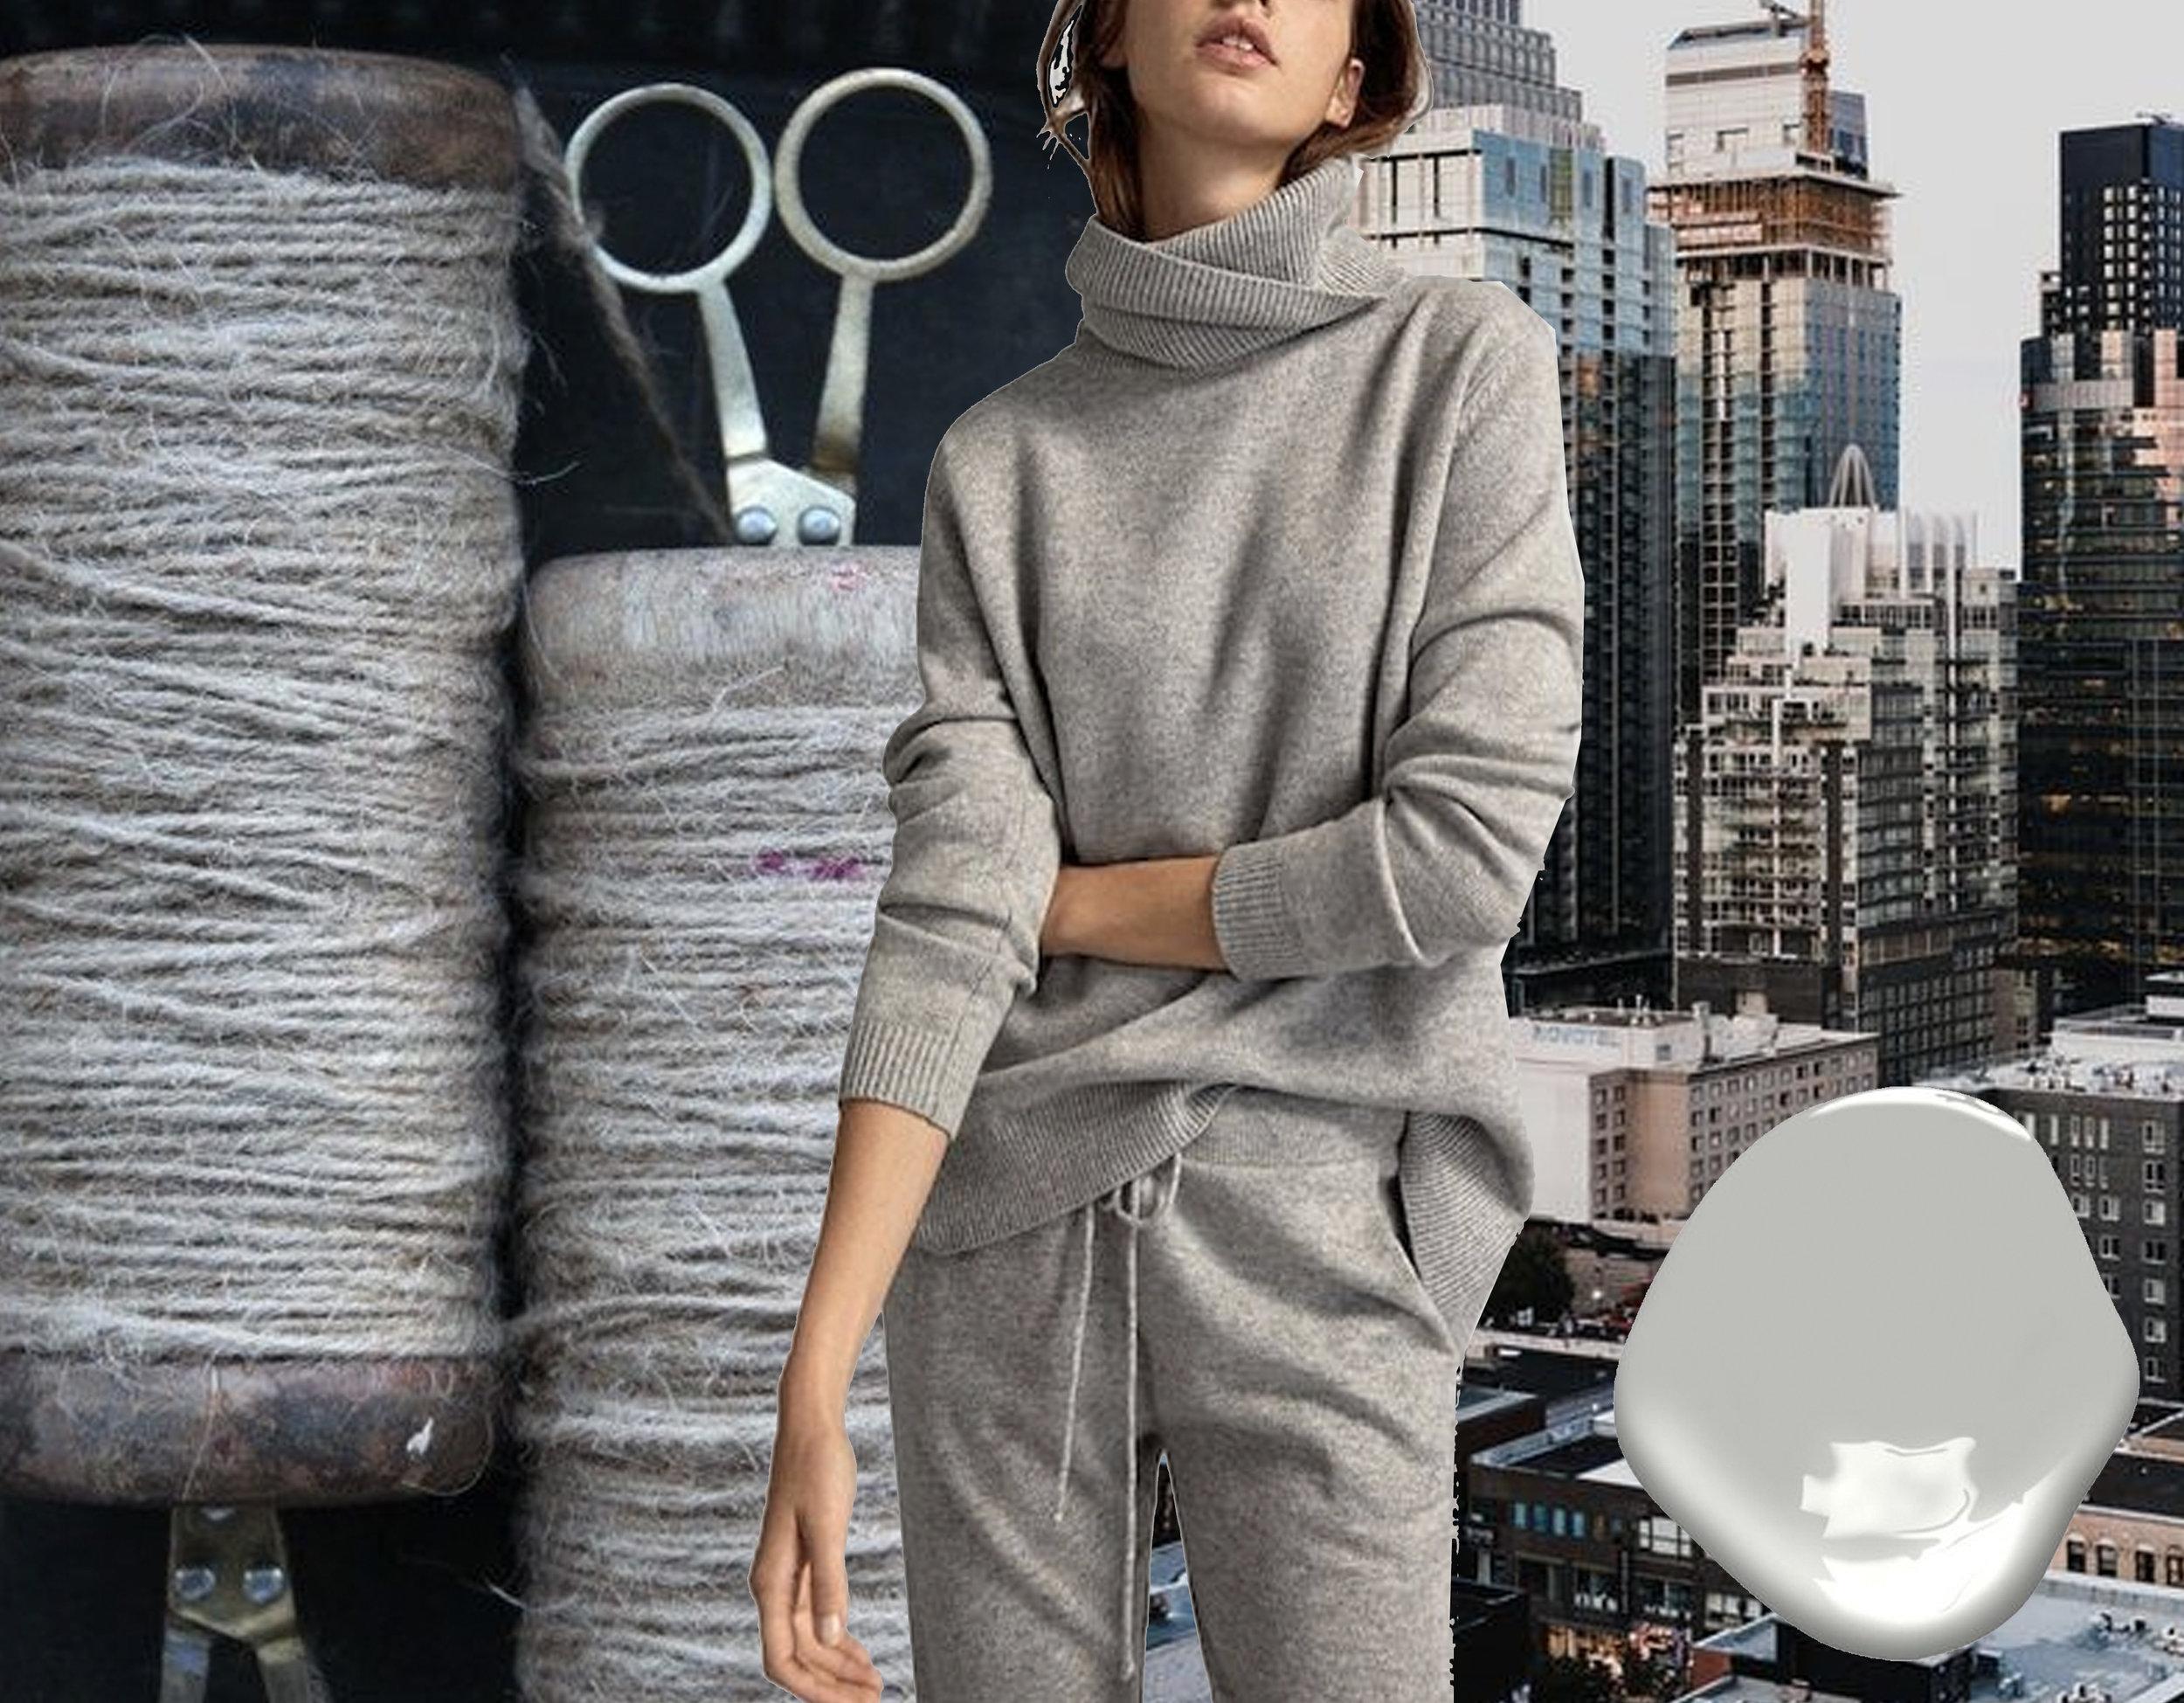 yarns via  Lifes good more often than not  - pullover Massimo Dutti via  Zalando  - city view via  Unsplash